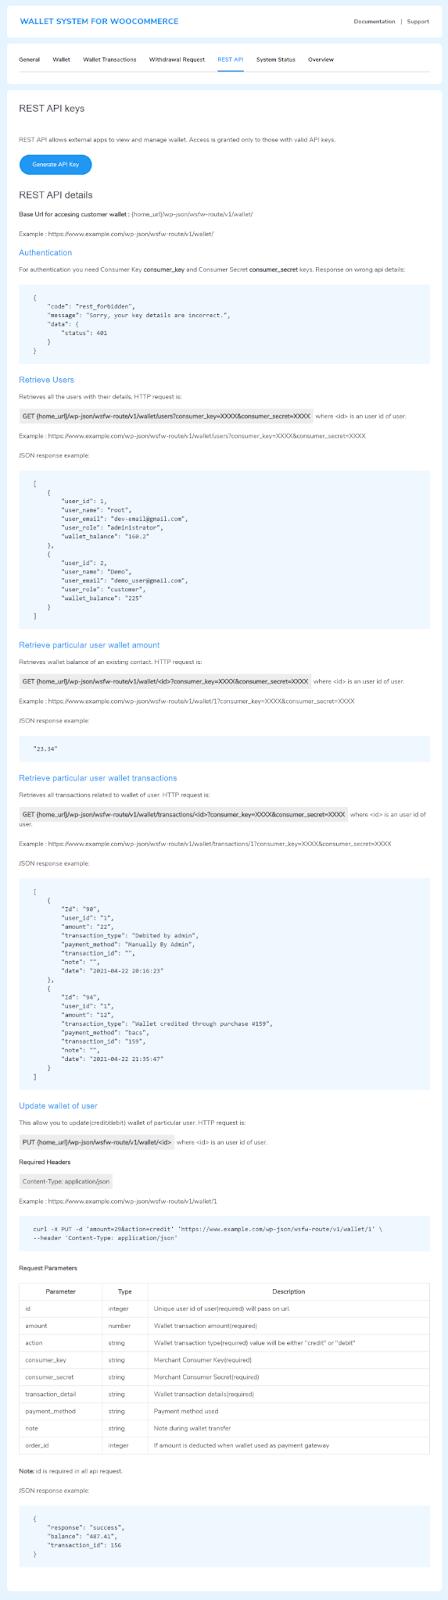 rest API setting